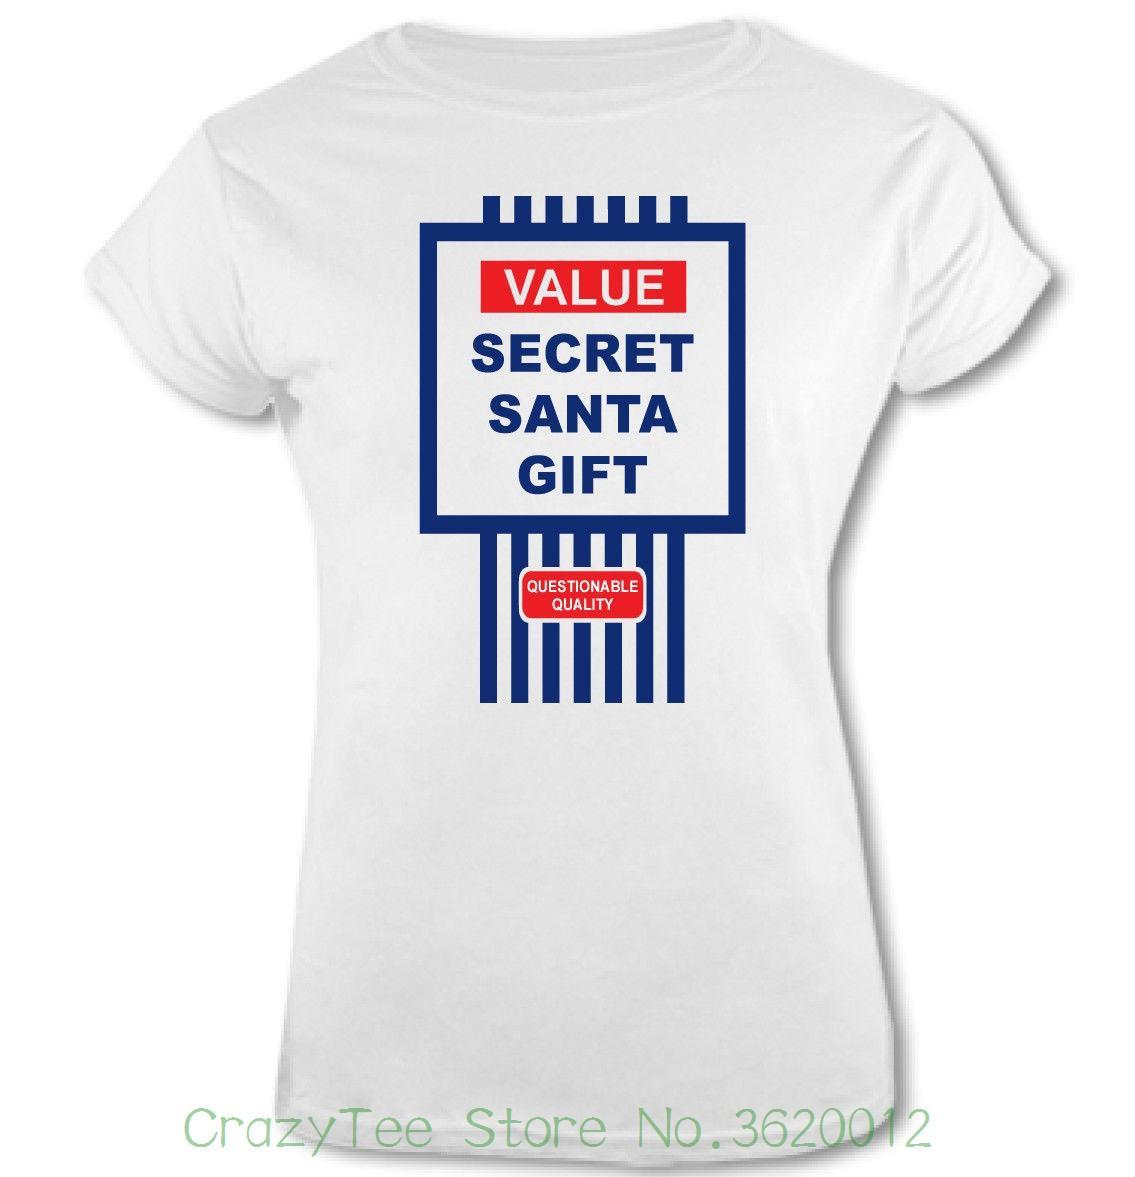 ab80d7a9 Women's Tee Tesco Value Style Secret Santa Gift Womens Funny Christmas T-shirt  Present Xmas Printed Tops Popular Tees